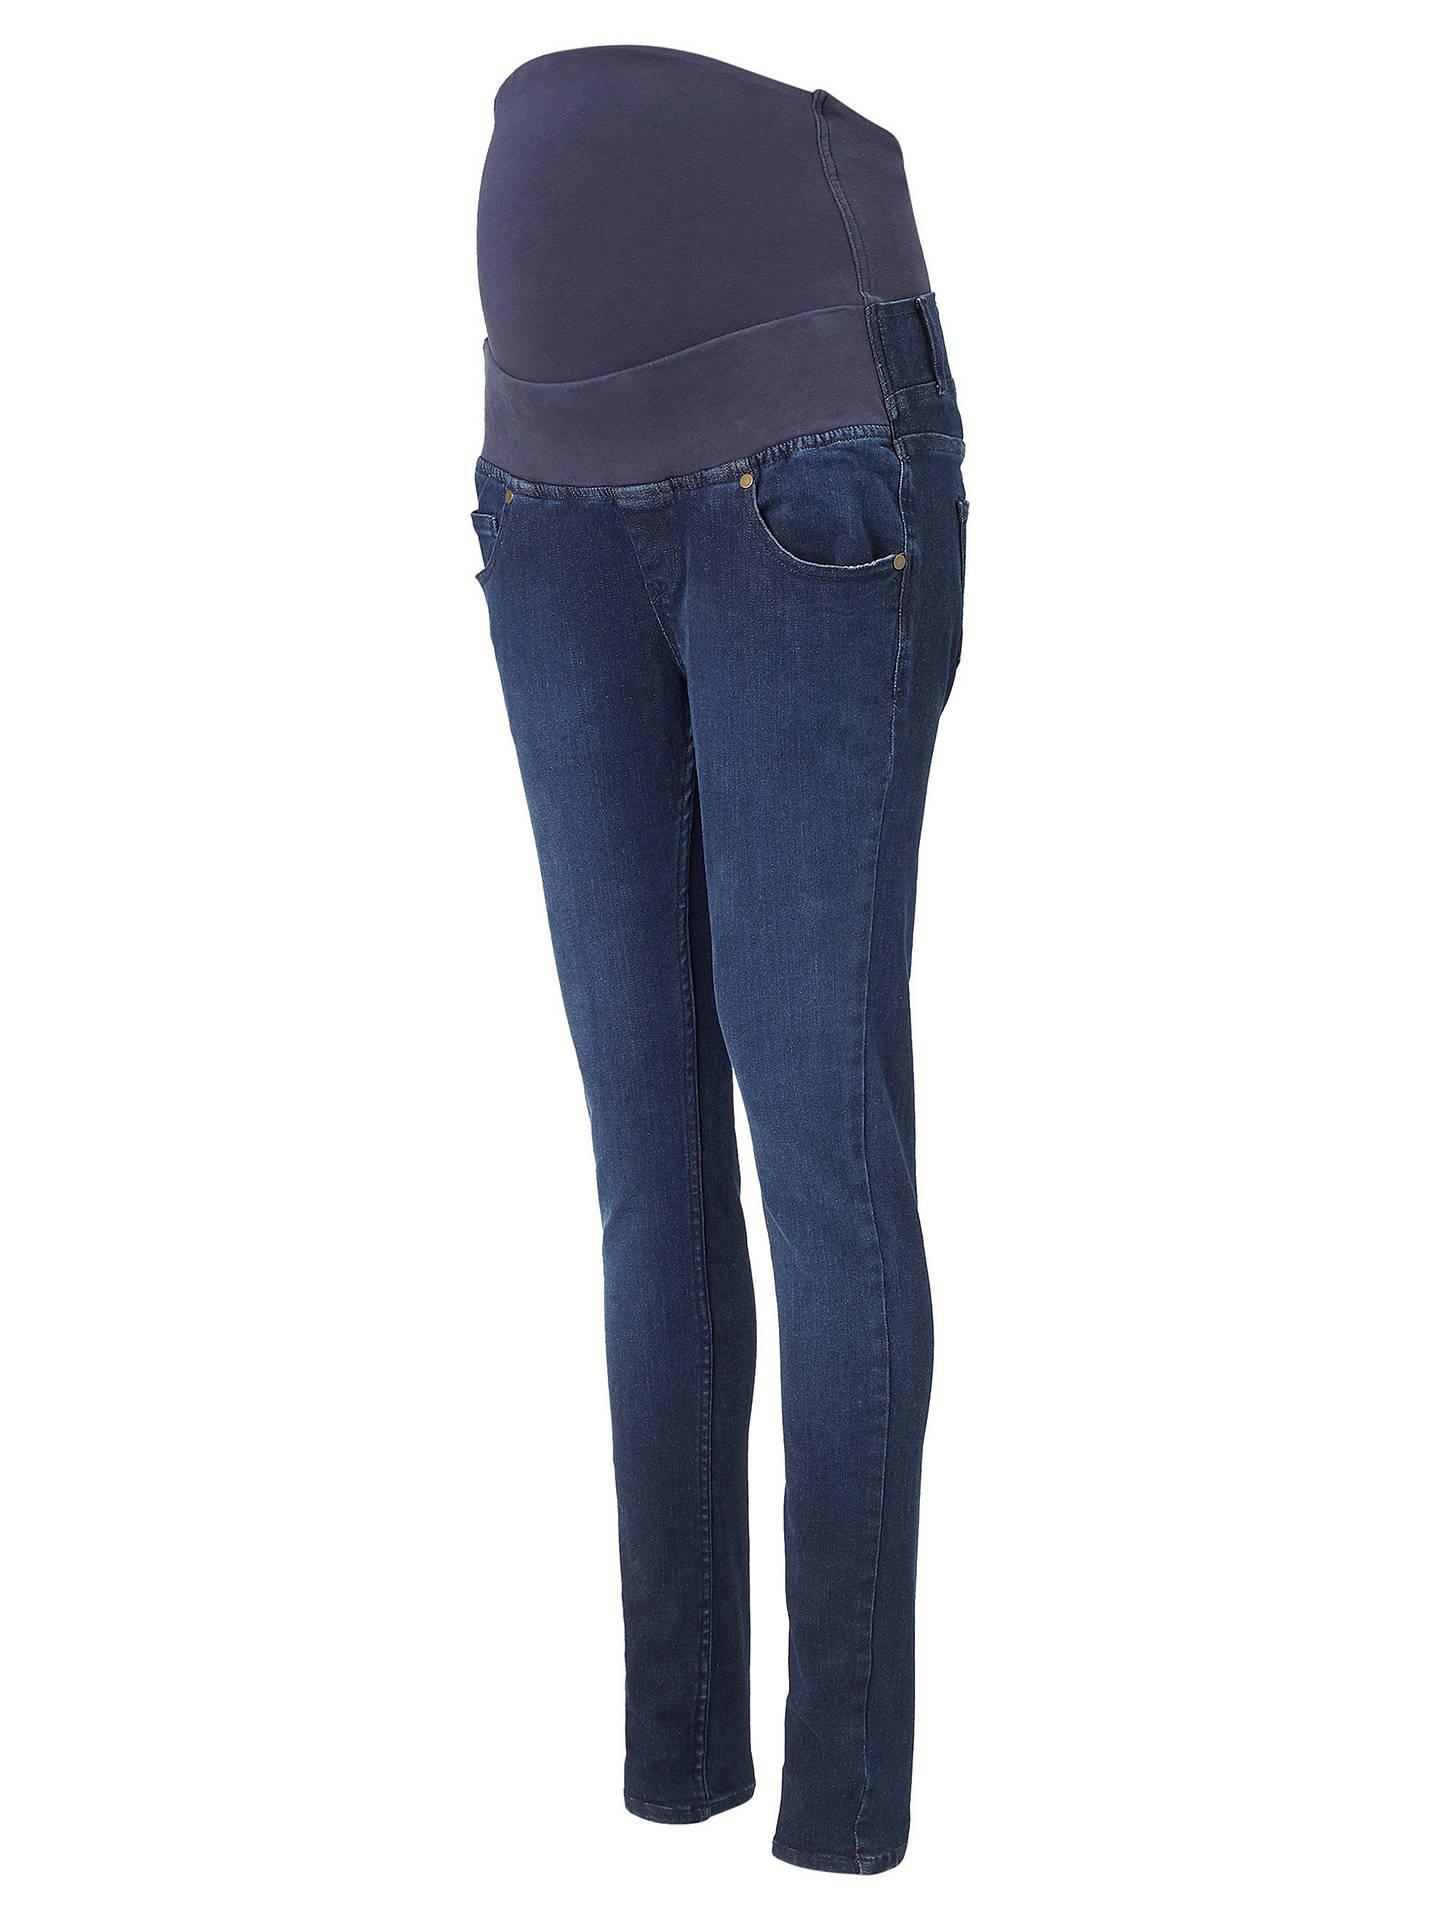 fa9f8d162ac46 ... Buy Isabella Oliver Zadie Super Stretch Skinny Denim Maternity Jeans,  Indigo, 4 Online at